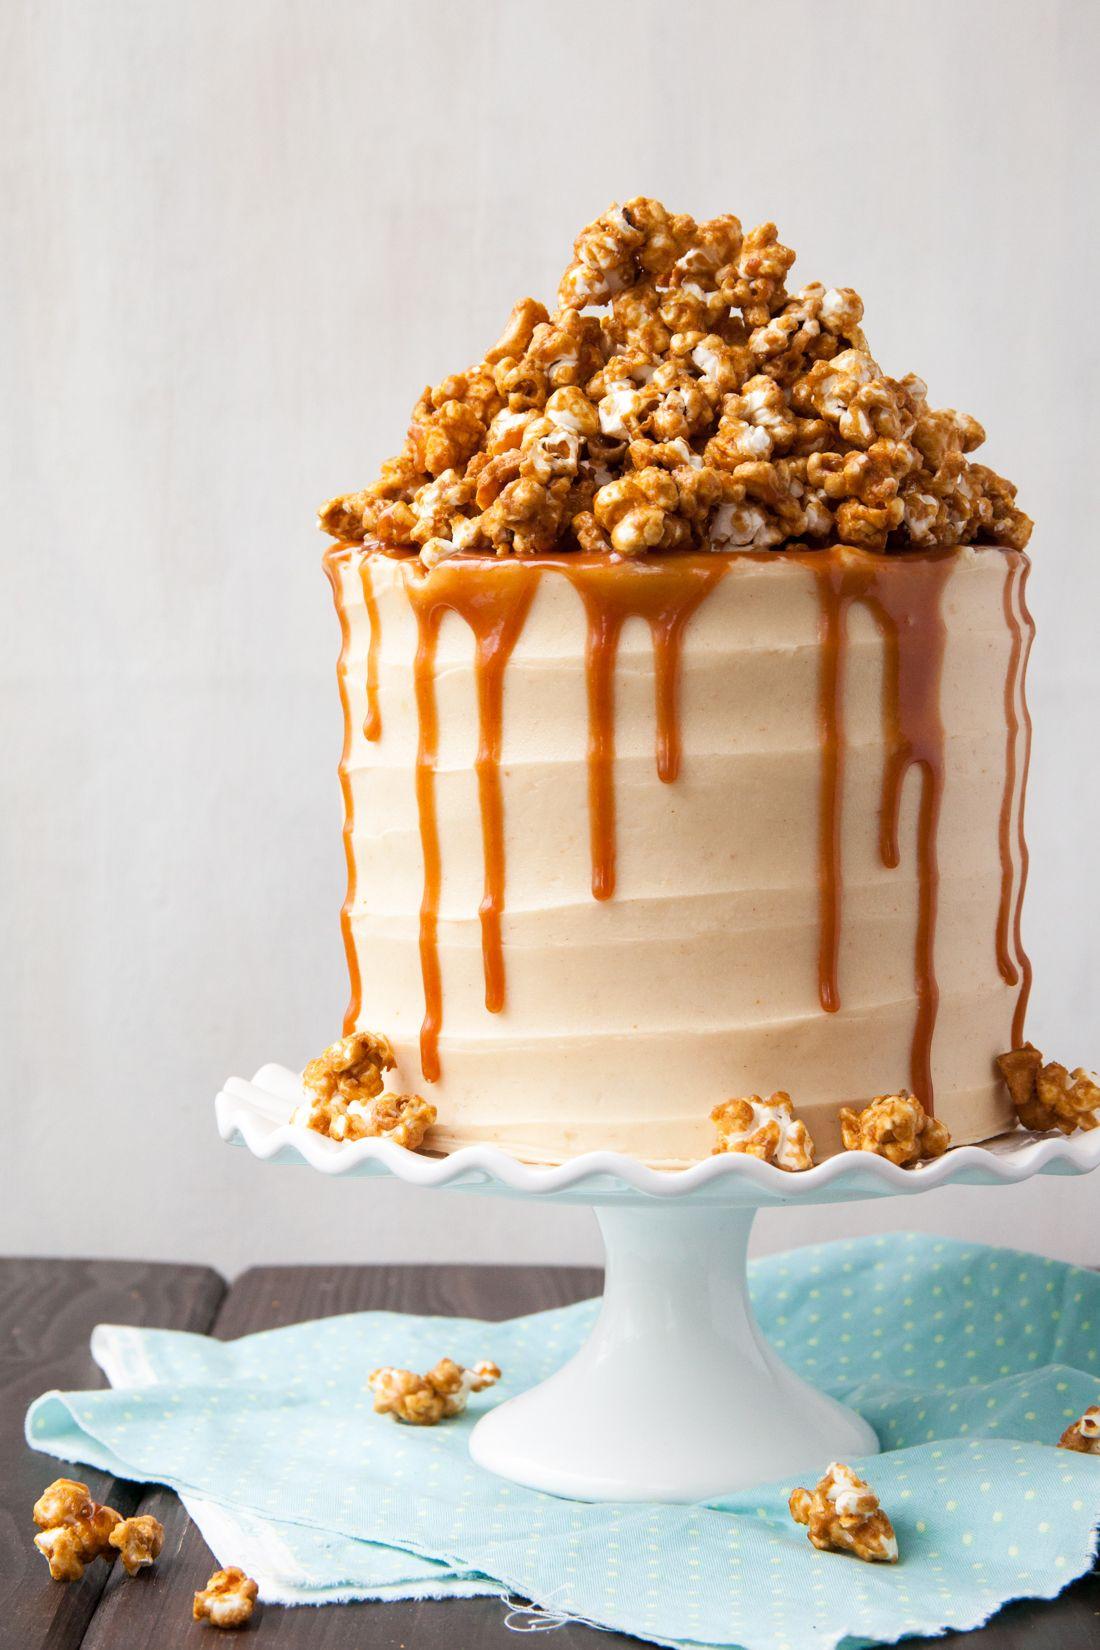 Style Sweet Popcorn Cake Caramel Popcorn Popcorn Cake Recipe